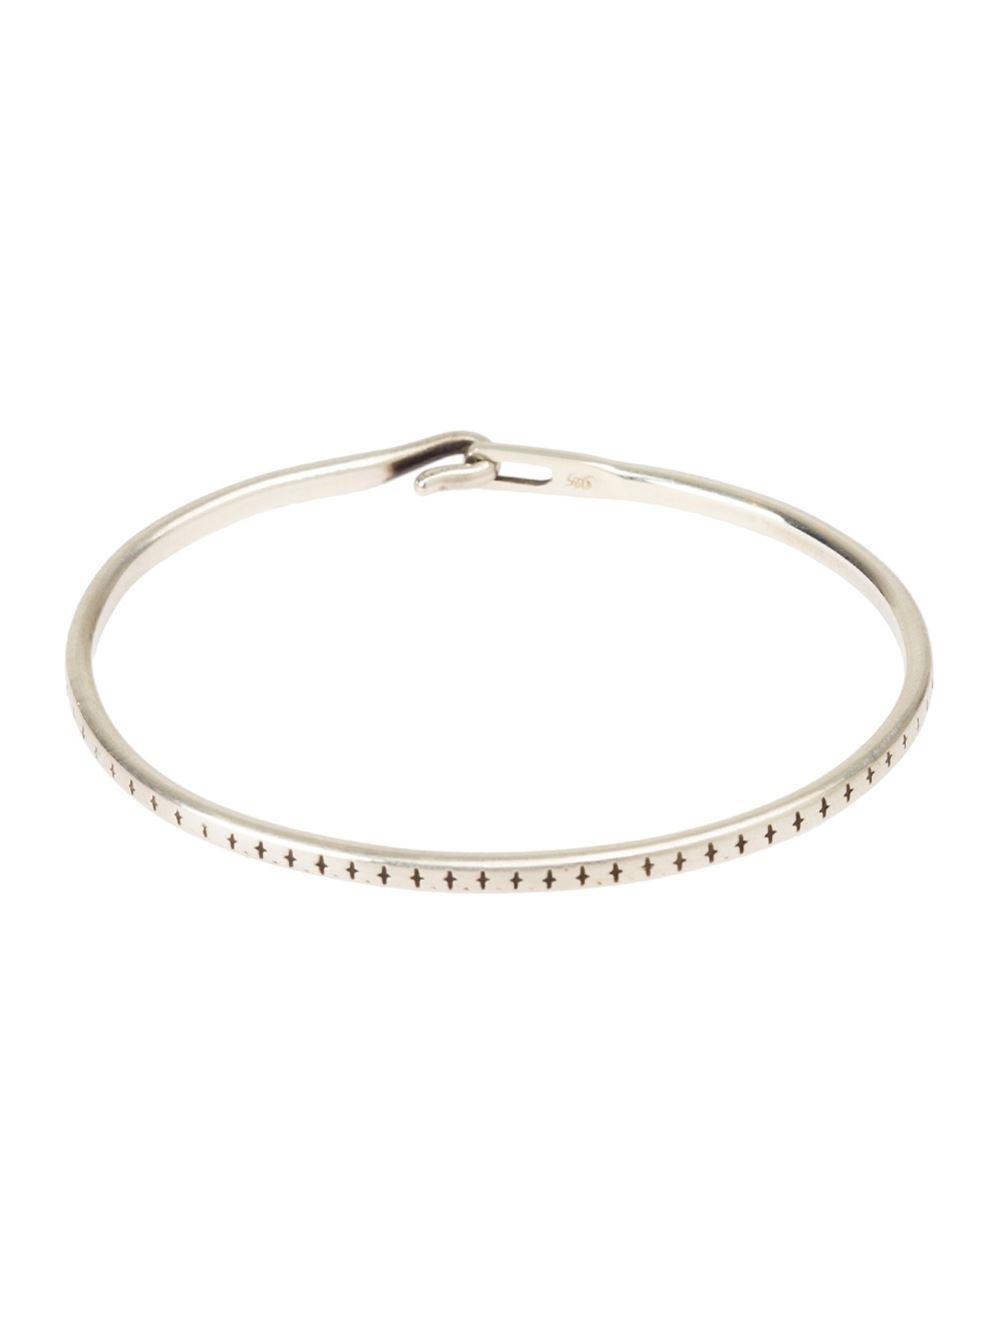 Werkstatt München hook closure bracelet - Metallic feFi9Yg